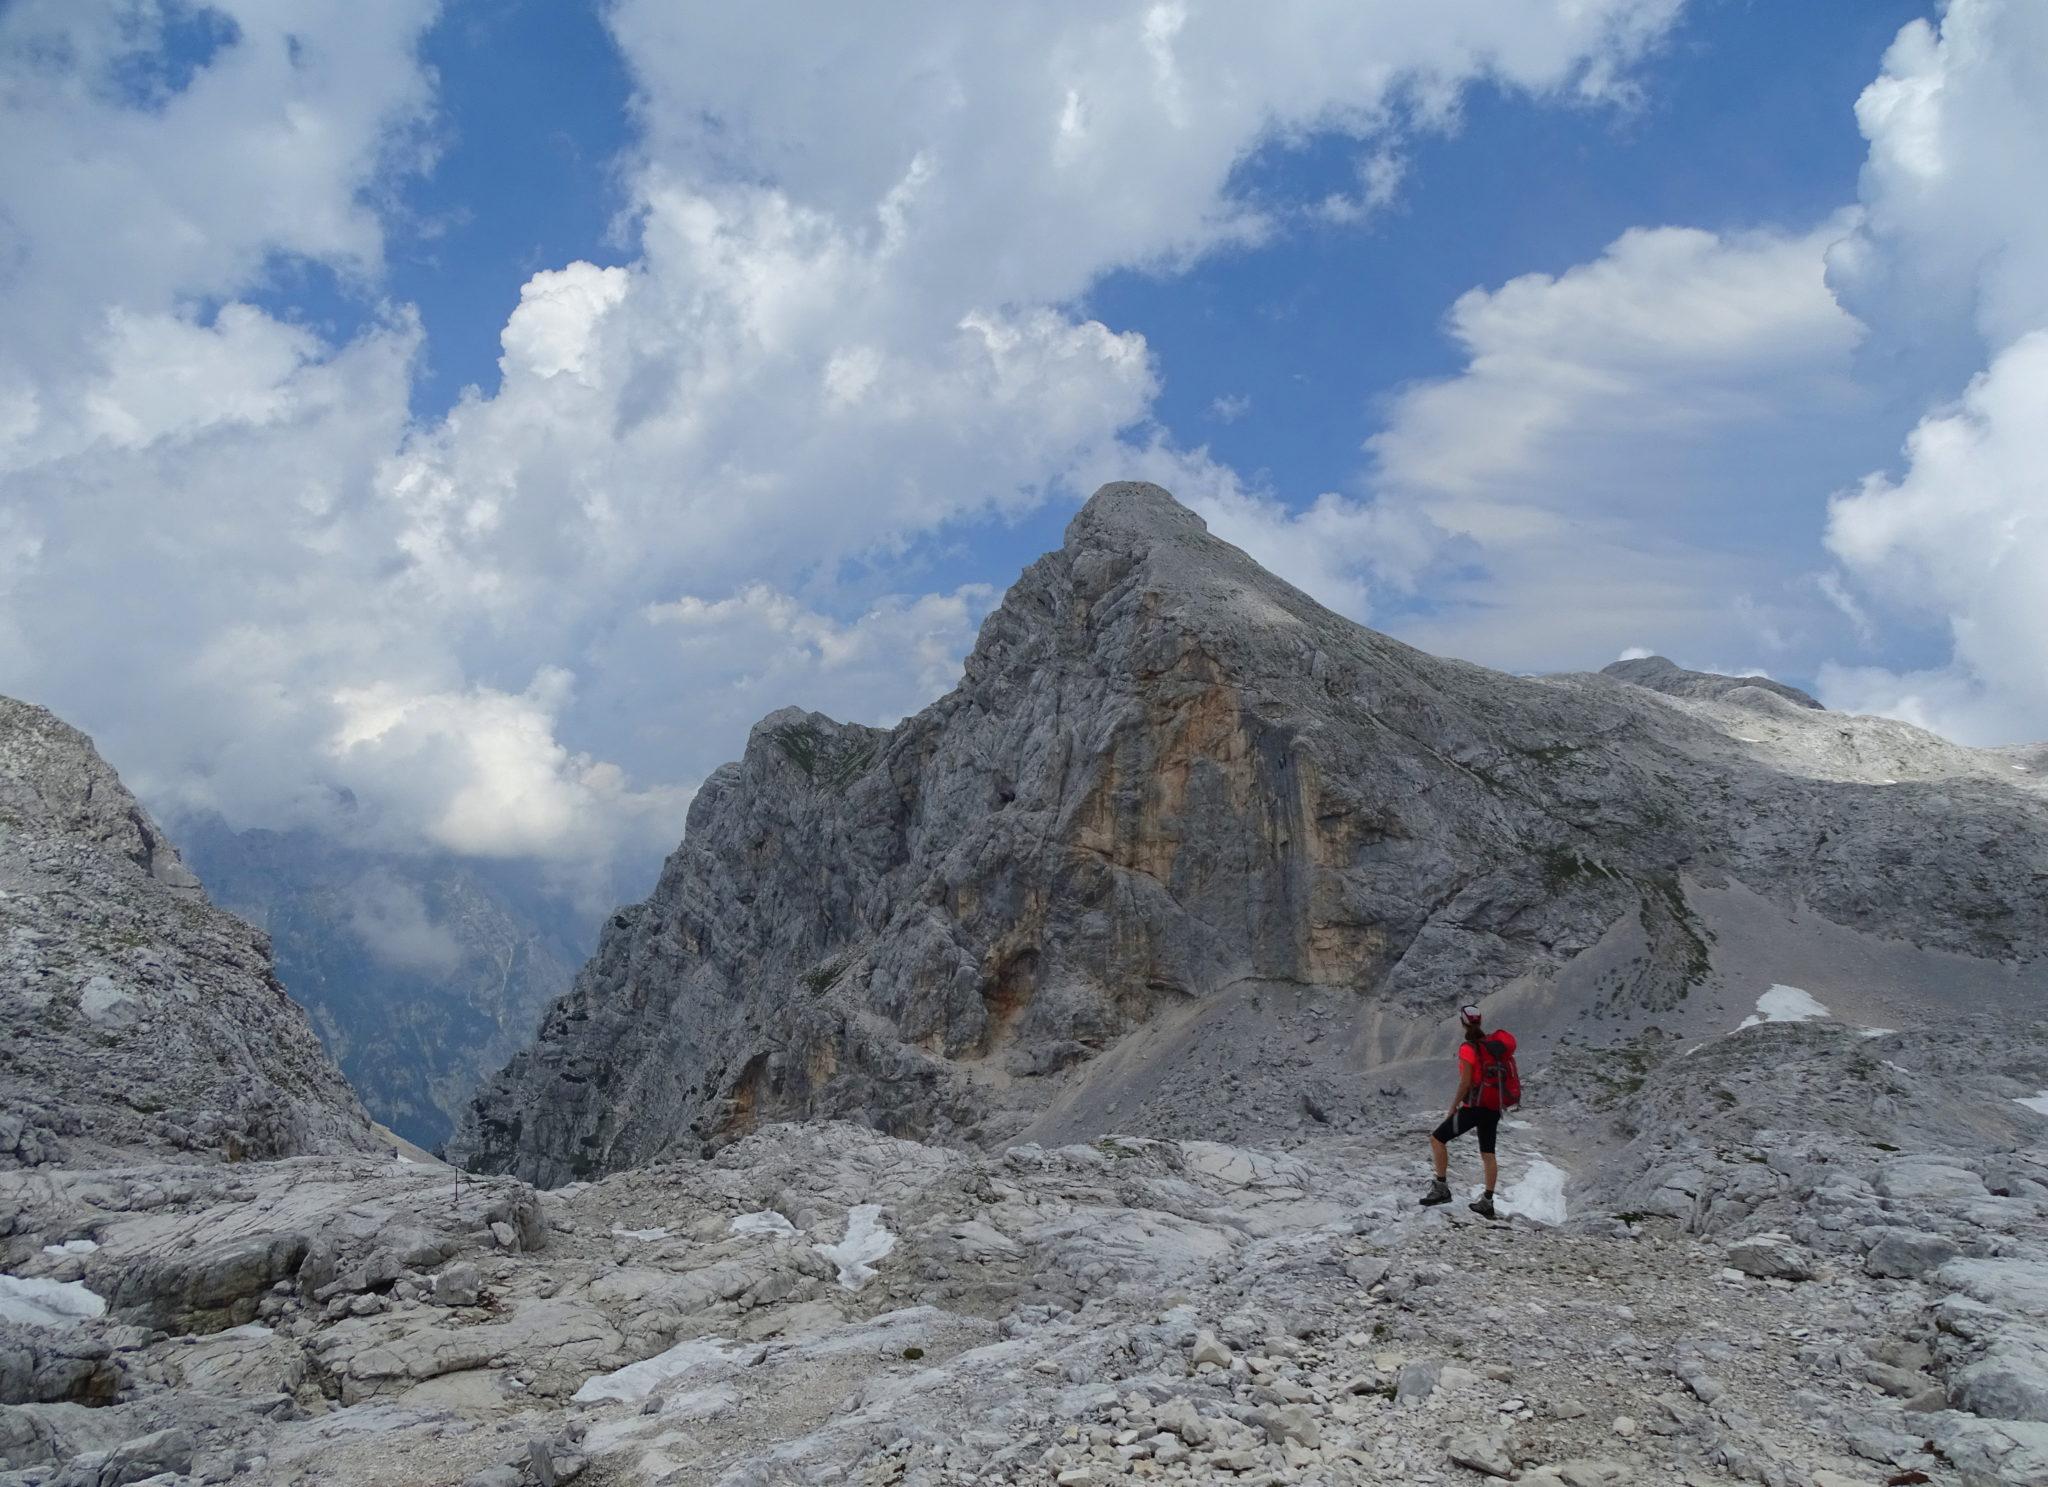 Hiking up to Triglav